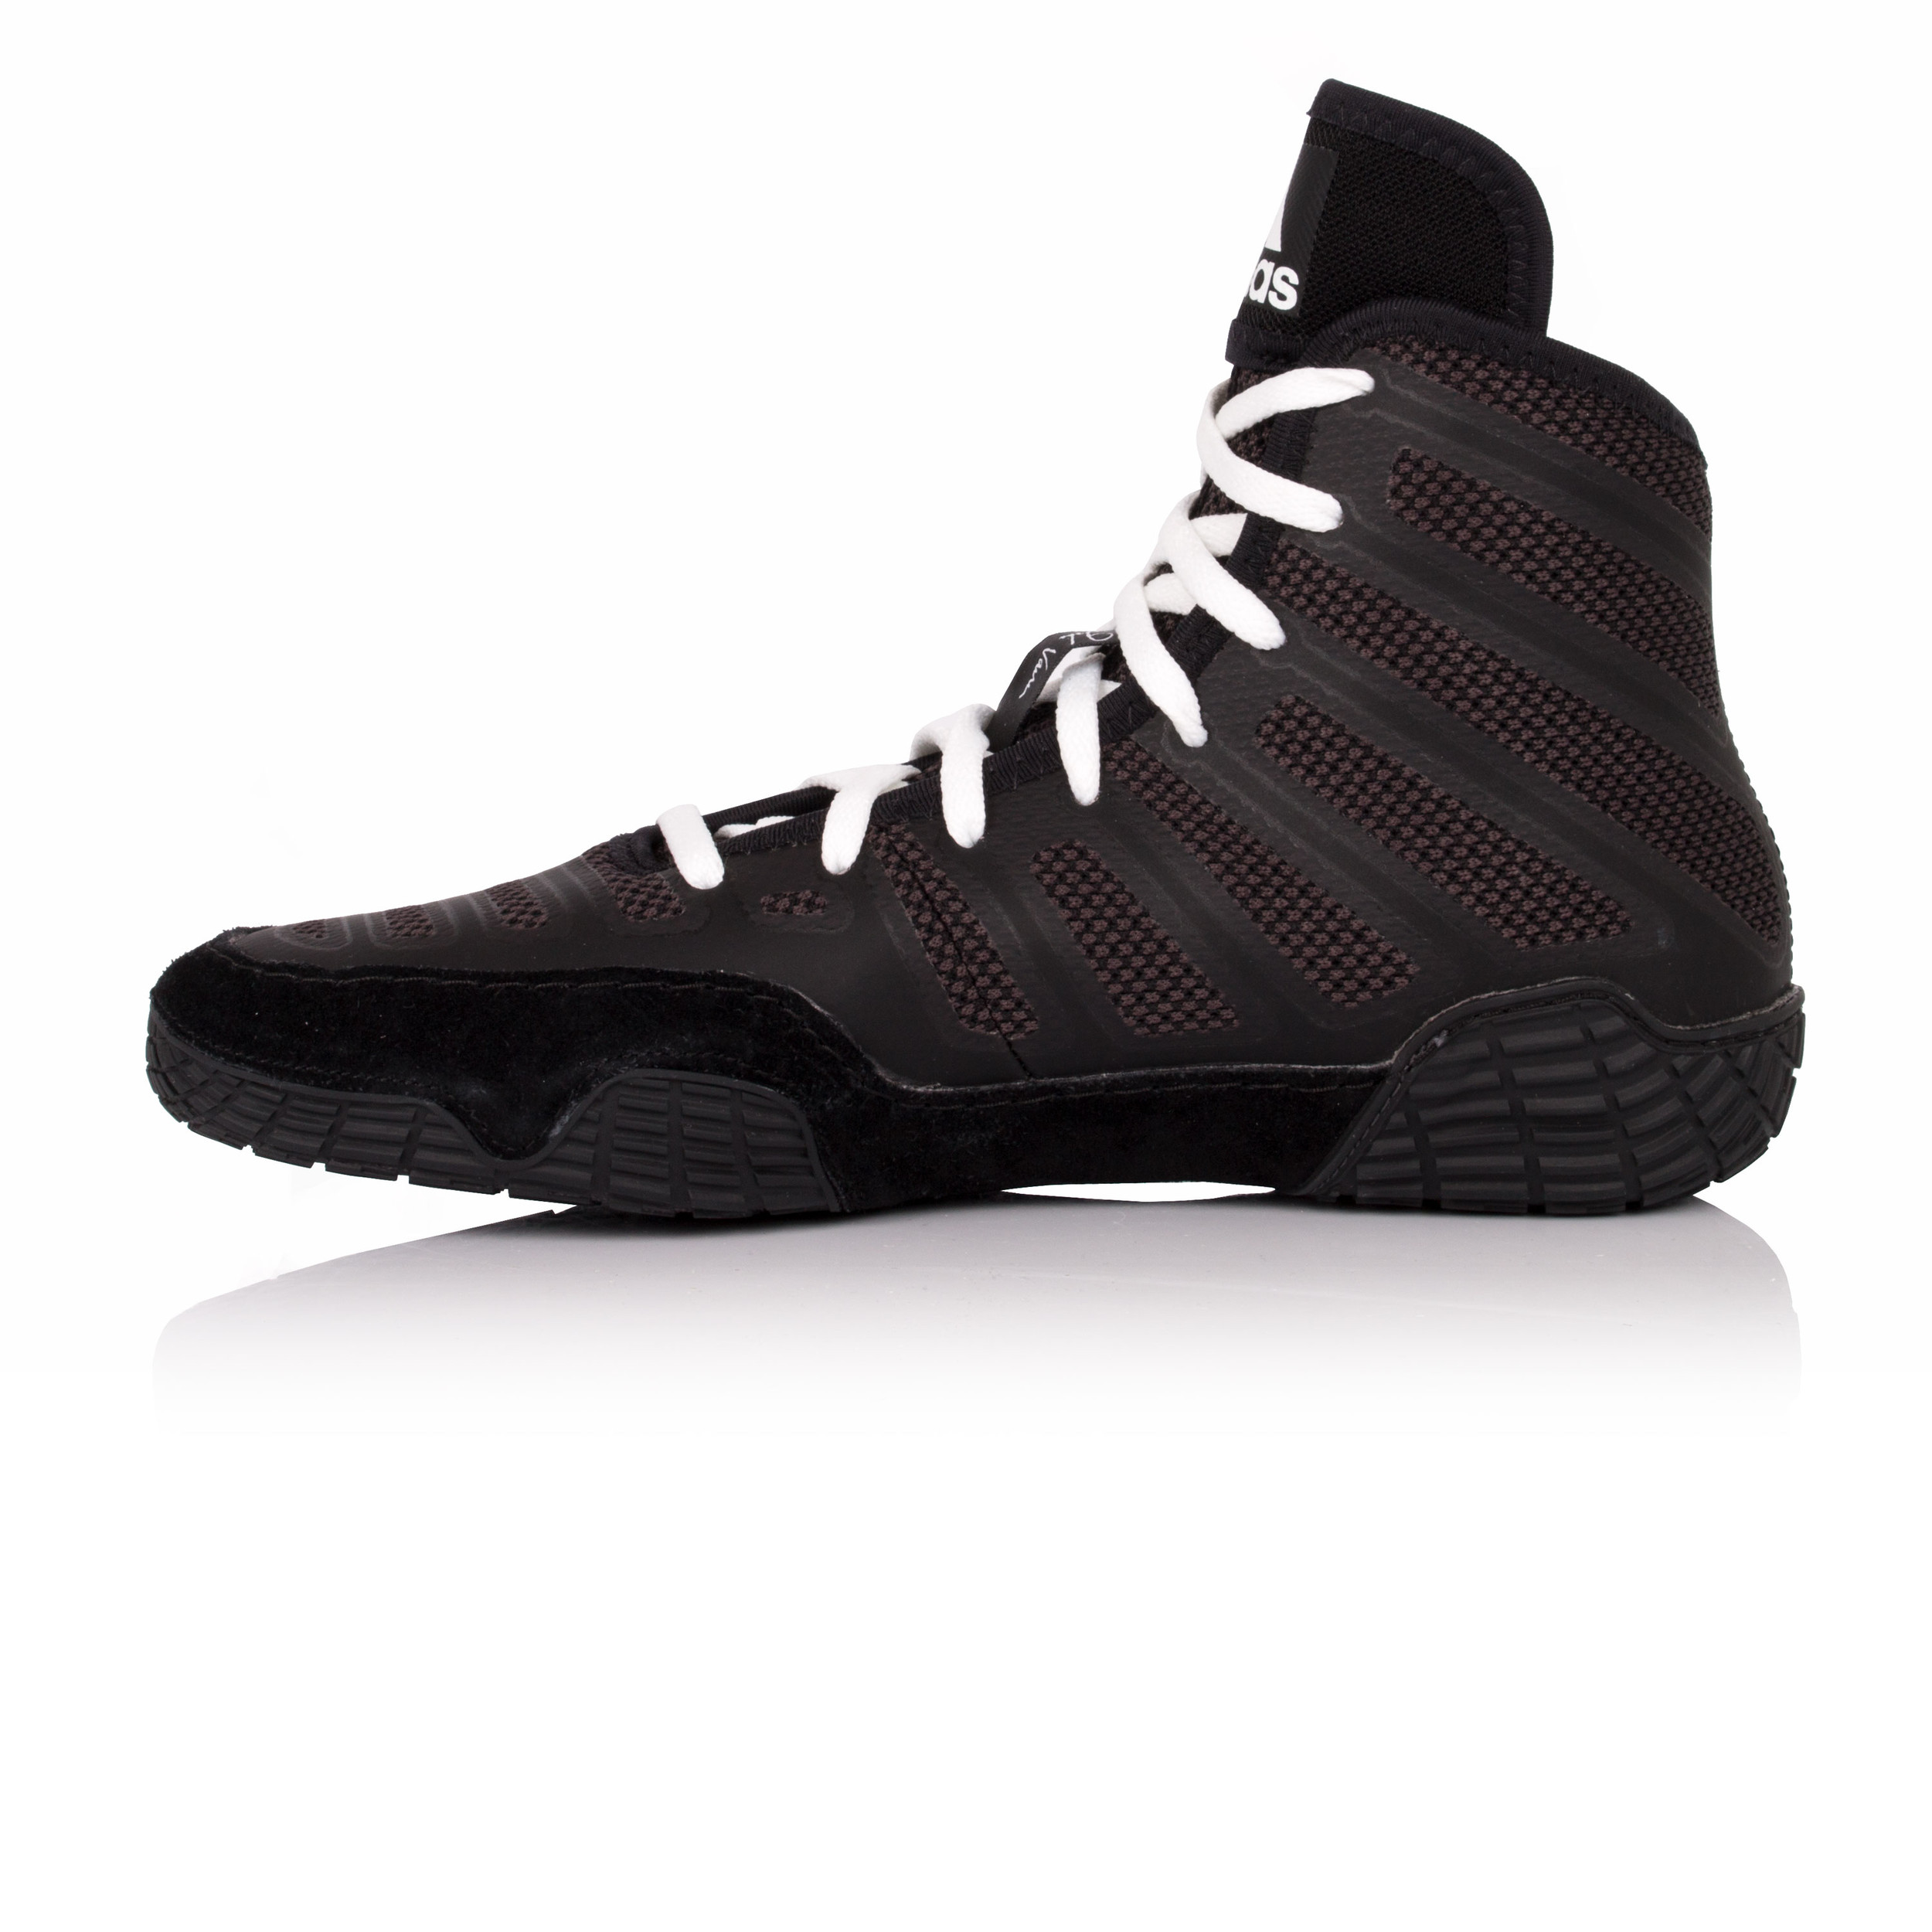 check out 70ae4 fdba0 Adidas Hombre Negro Varner Wrestling Botas Zapatos Zapatillas Calzado  Deporte